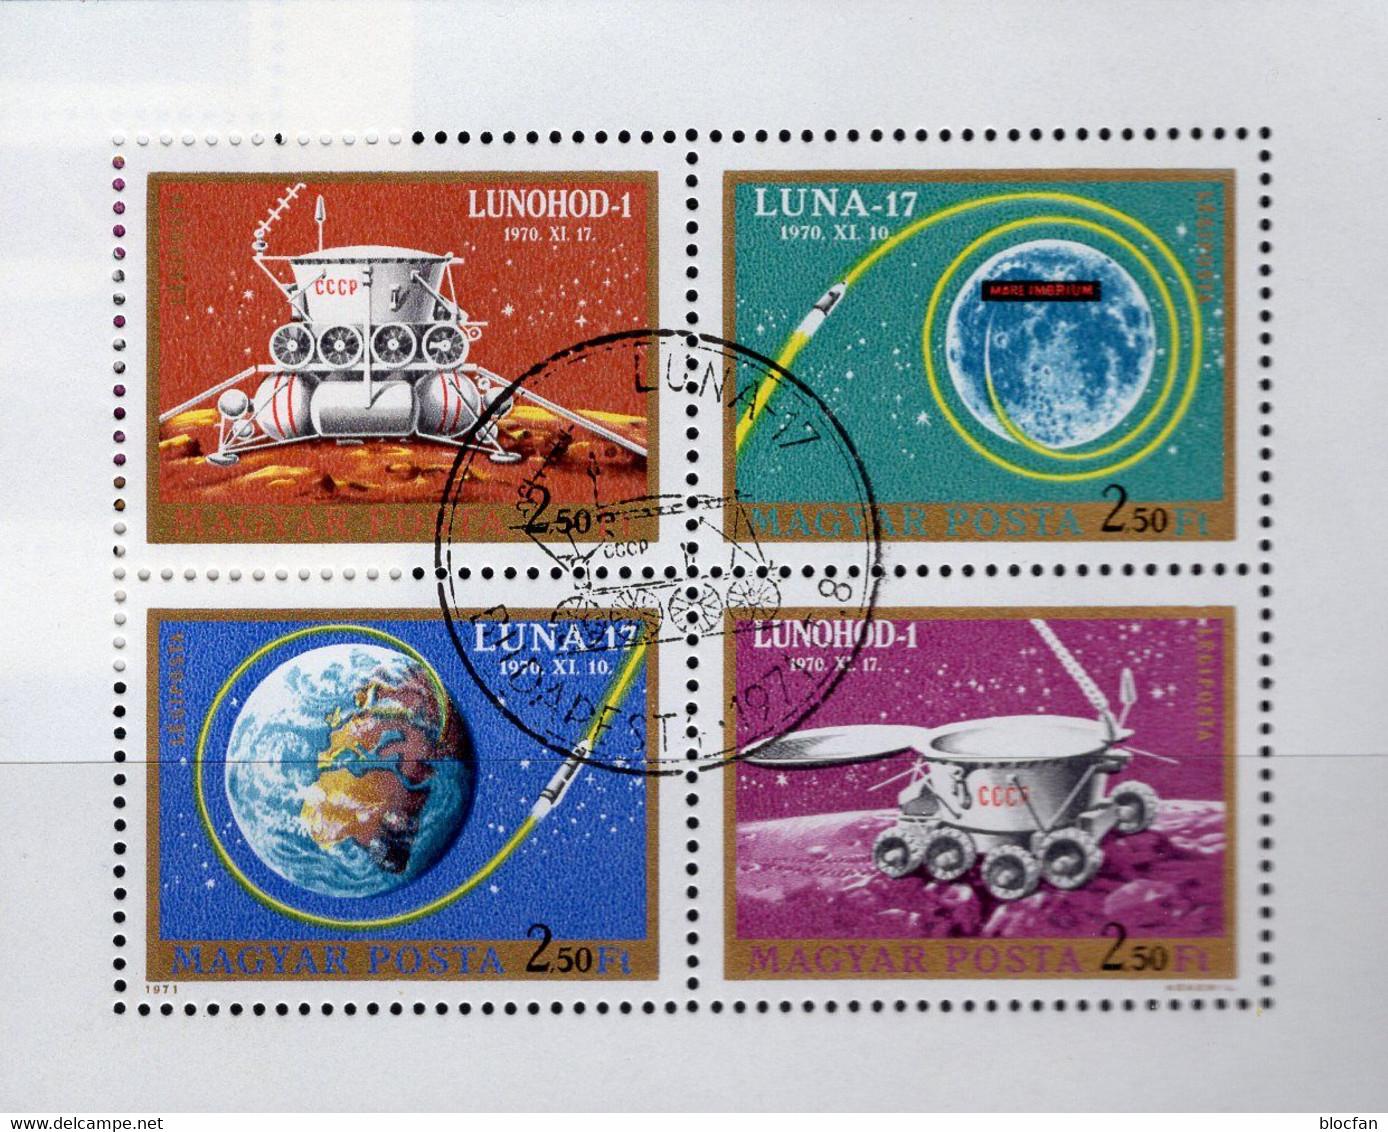 Mittel-/Nord-Europa 2012/2013 Michel Katalog Neu 116€ Band 1+5 A CH CSR HU FL Slowakei UNO S DK N Island Esti Litauen LA - Autriche